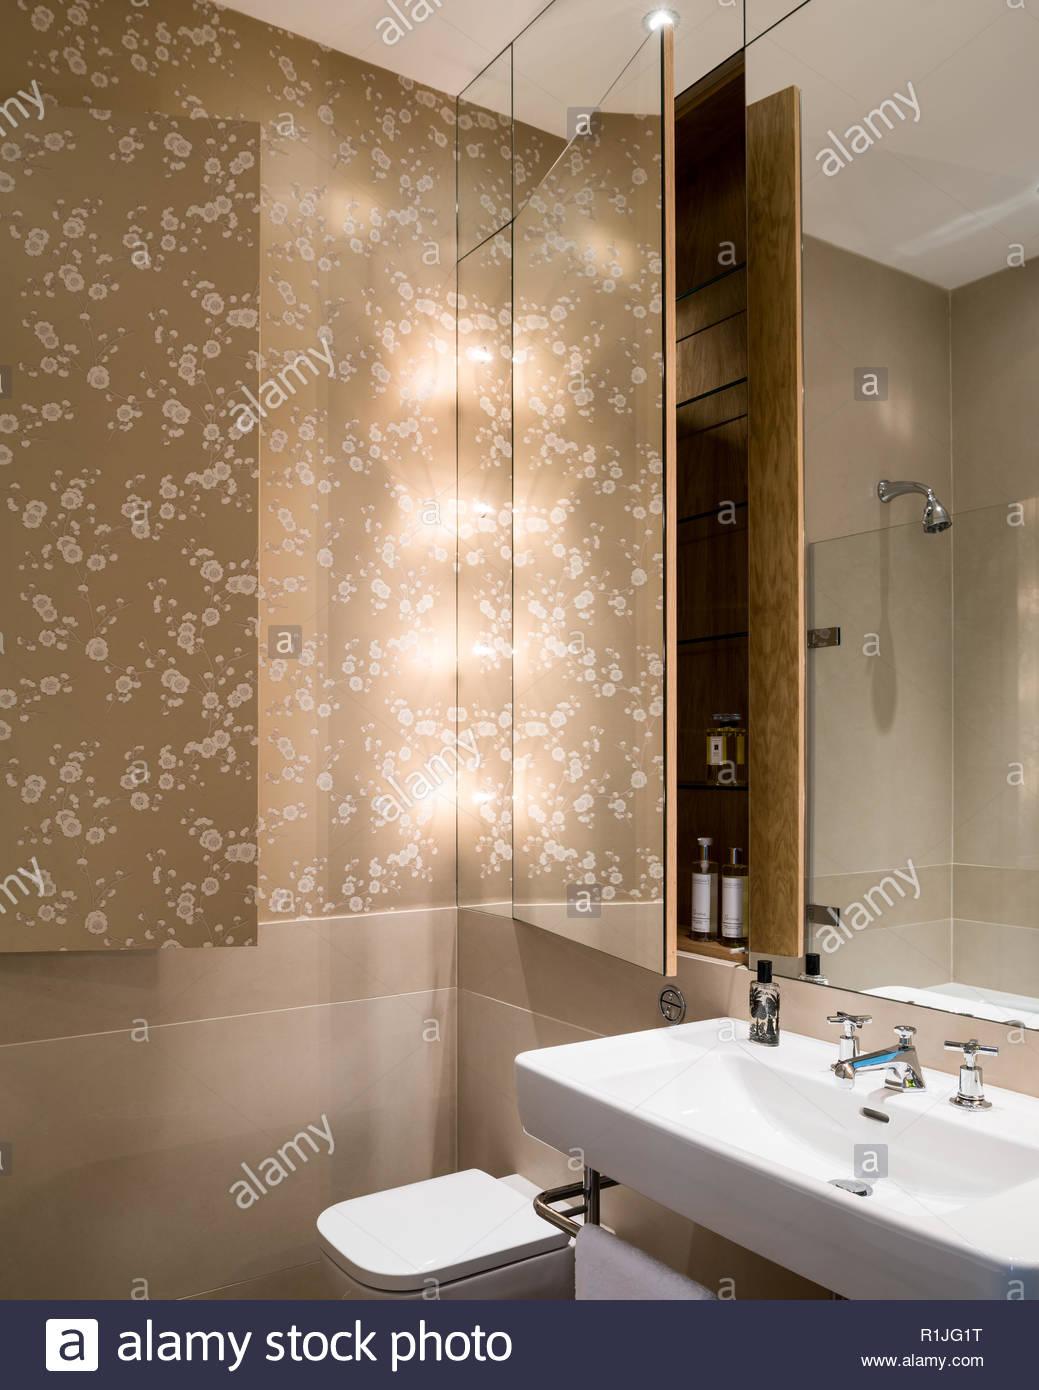 Concealed storage in bathroom - Stock Image